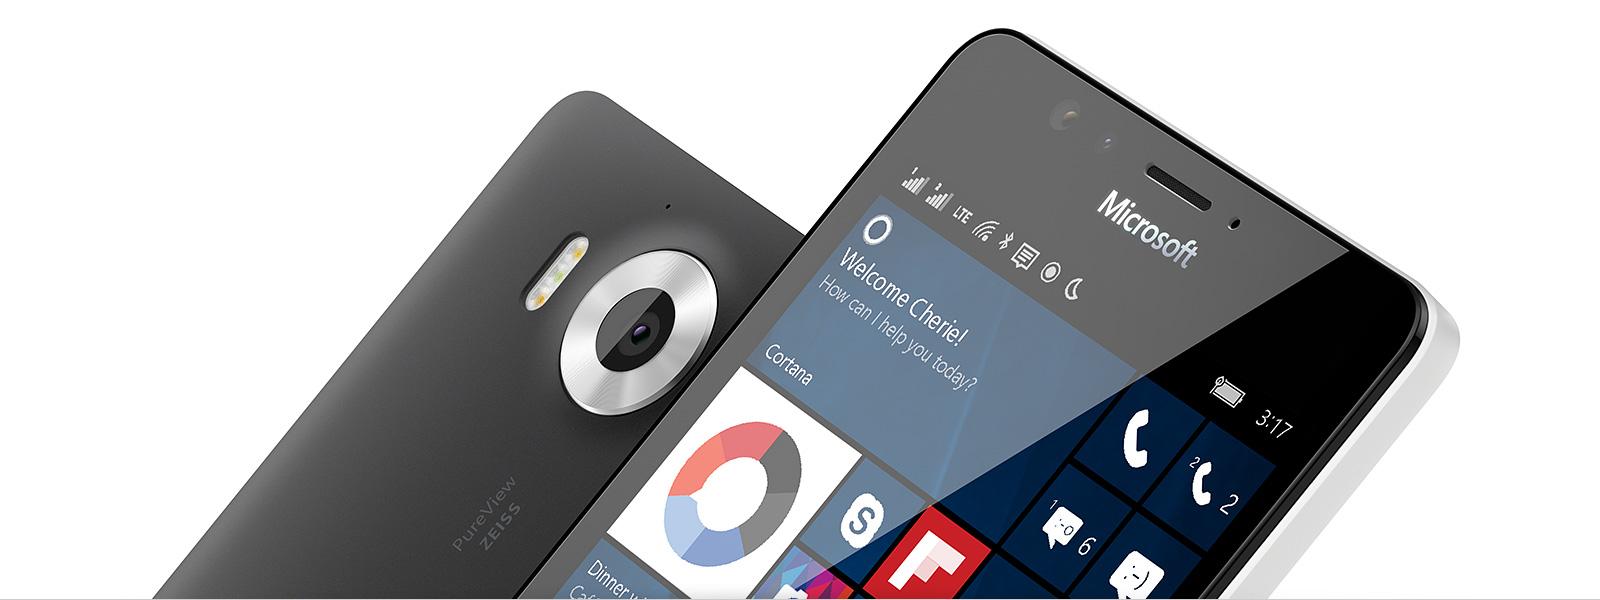 Windows 10 mobile phones